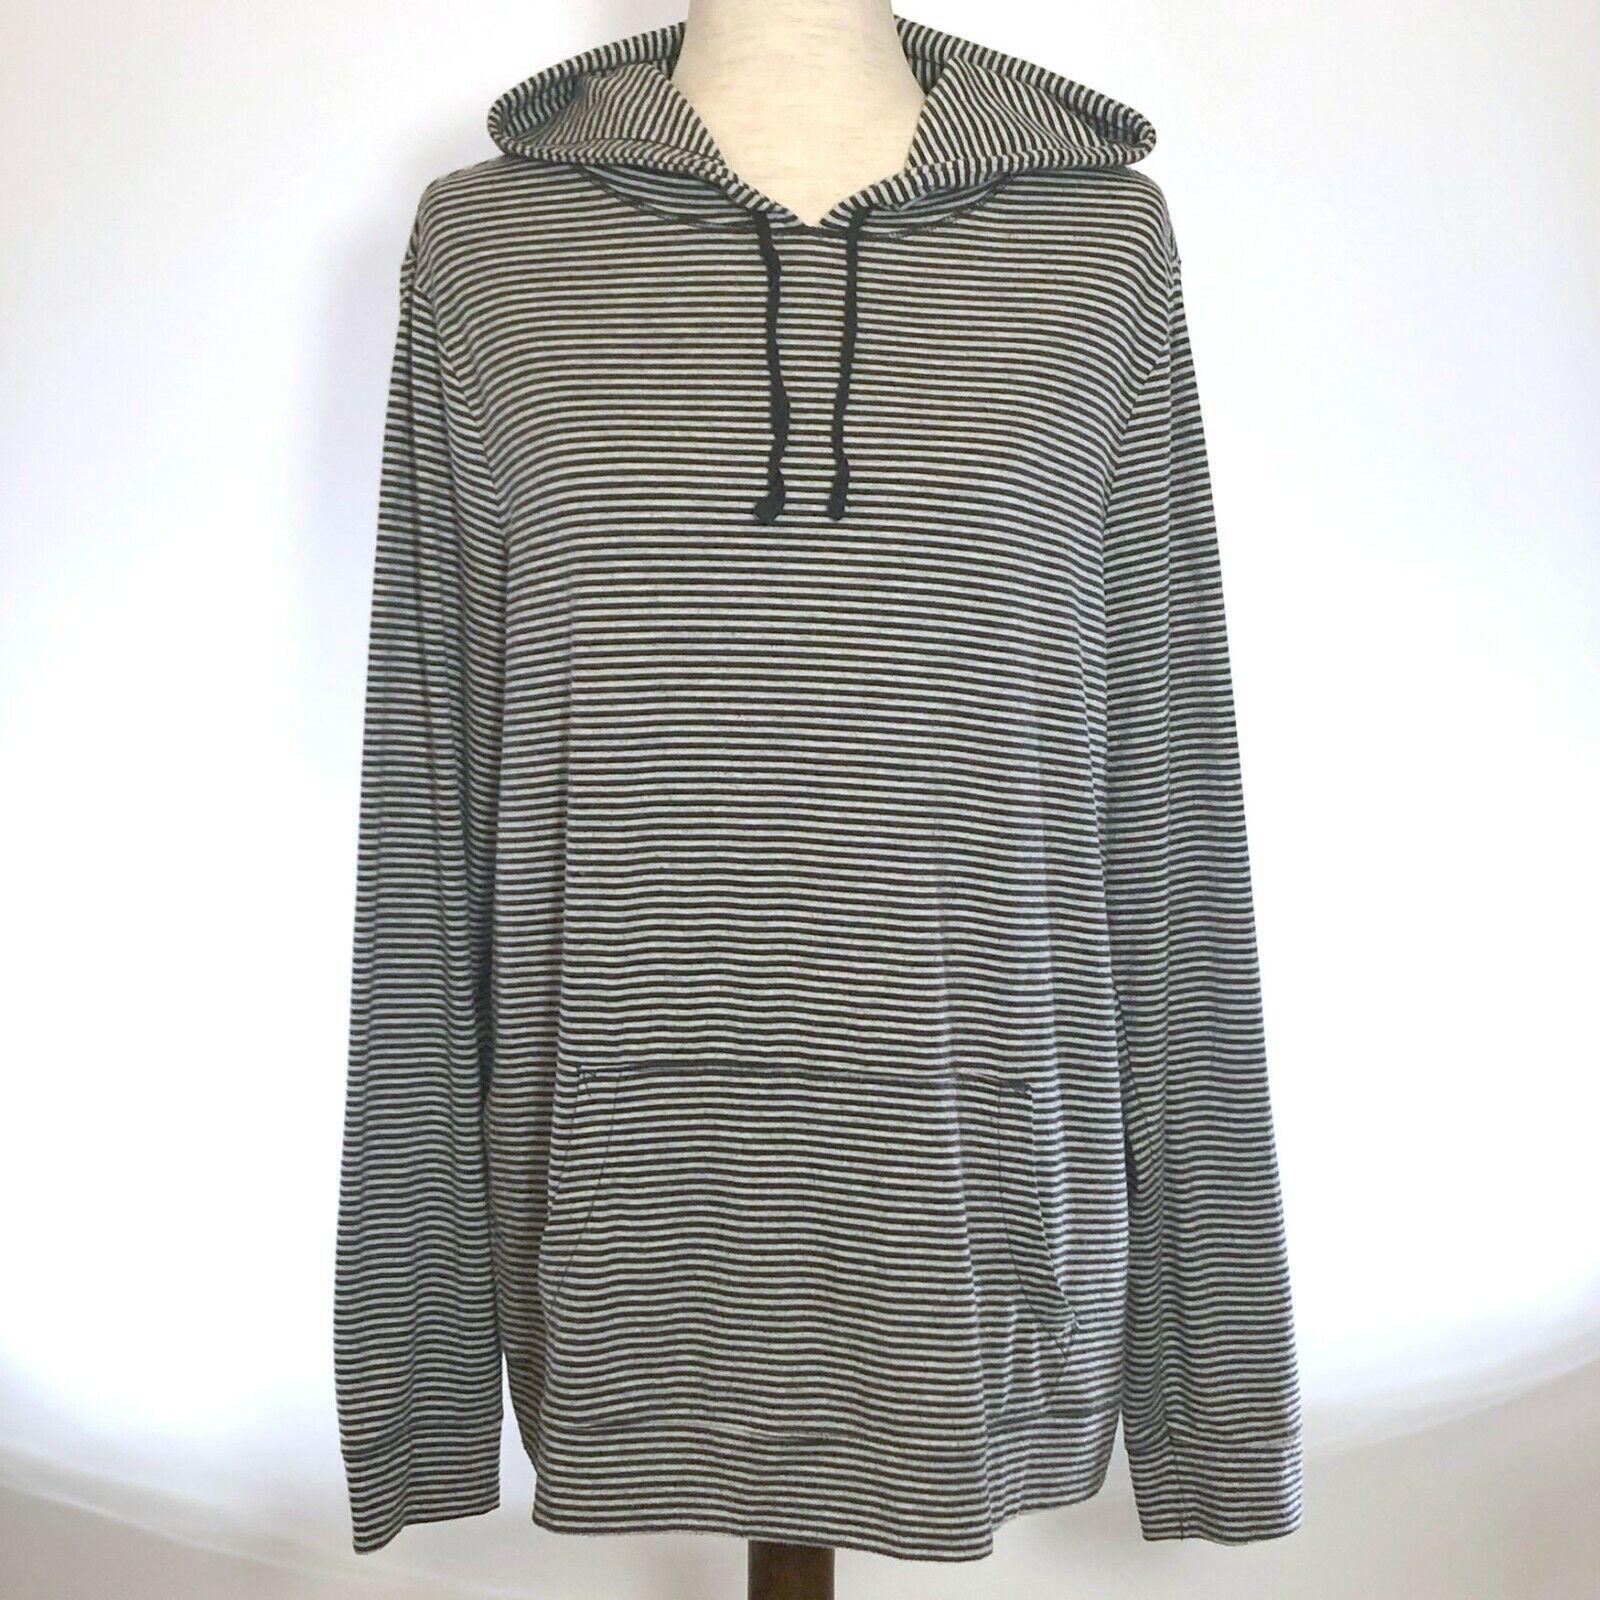 Old Navy Womens Hoodie Top Sz XL Pullover Navy White Stripe Kangaroo Pocket